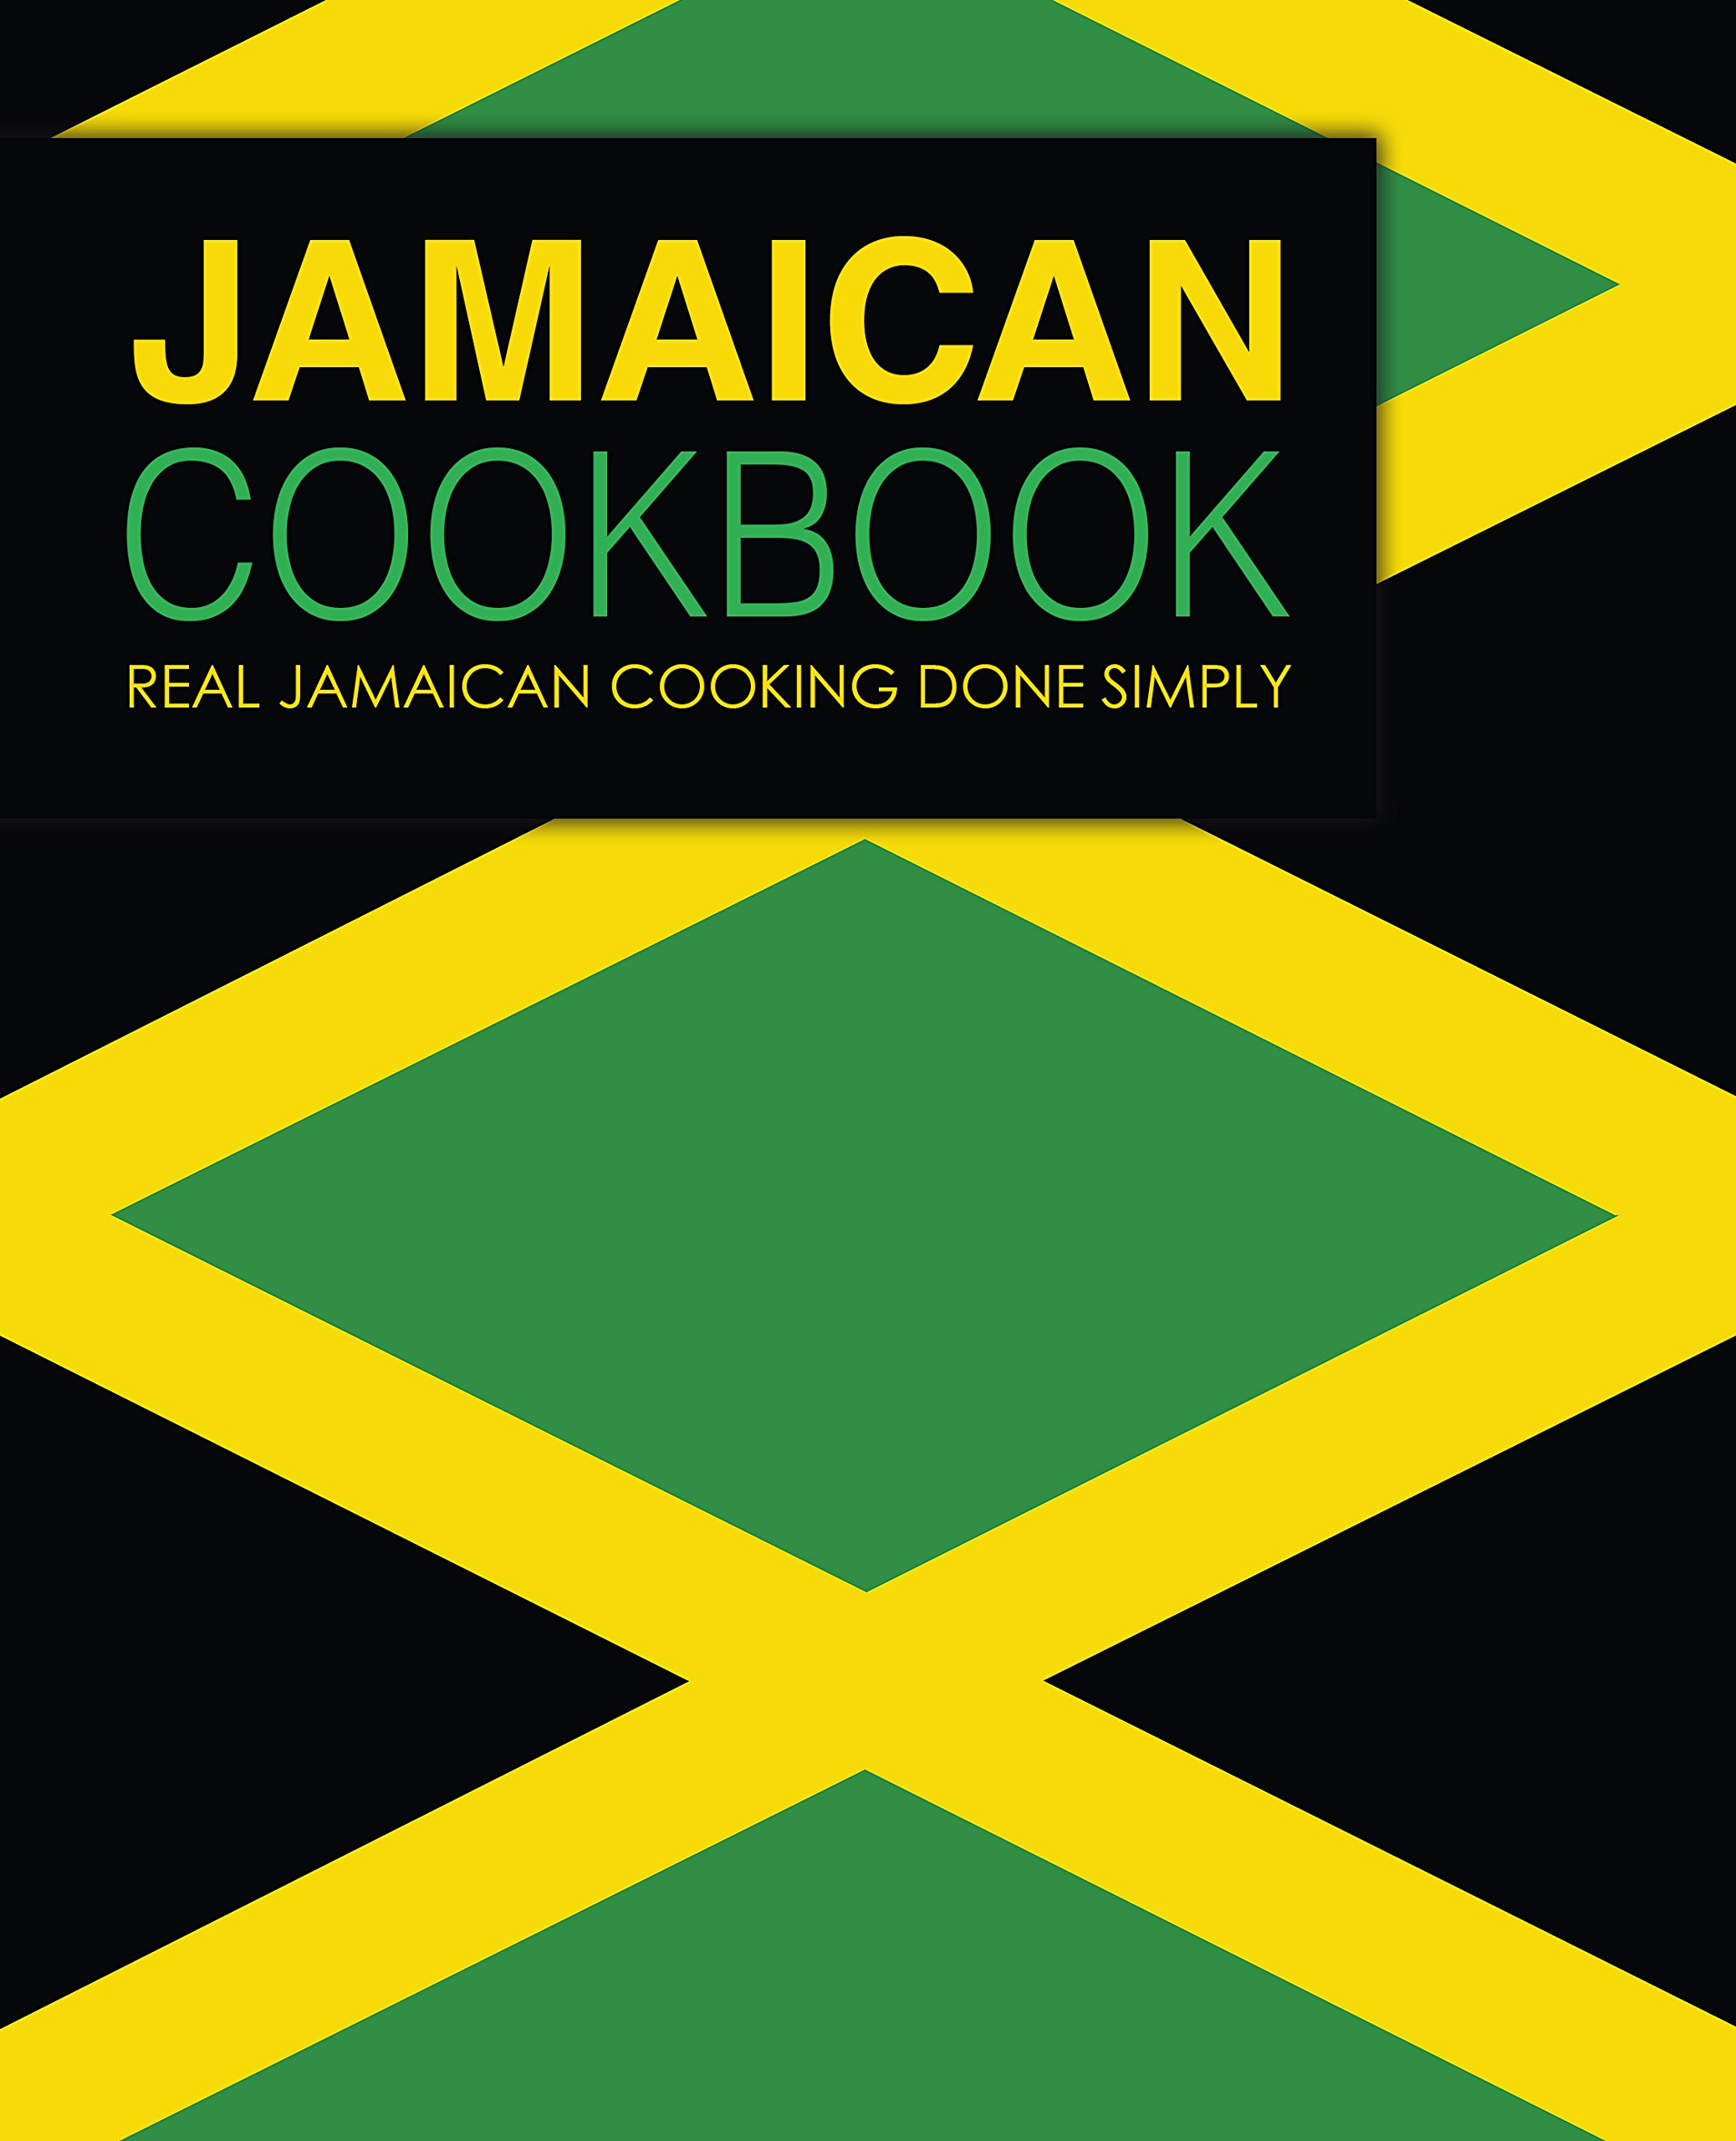 Jamaican Cookbook Real Cooking Simply ebook